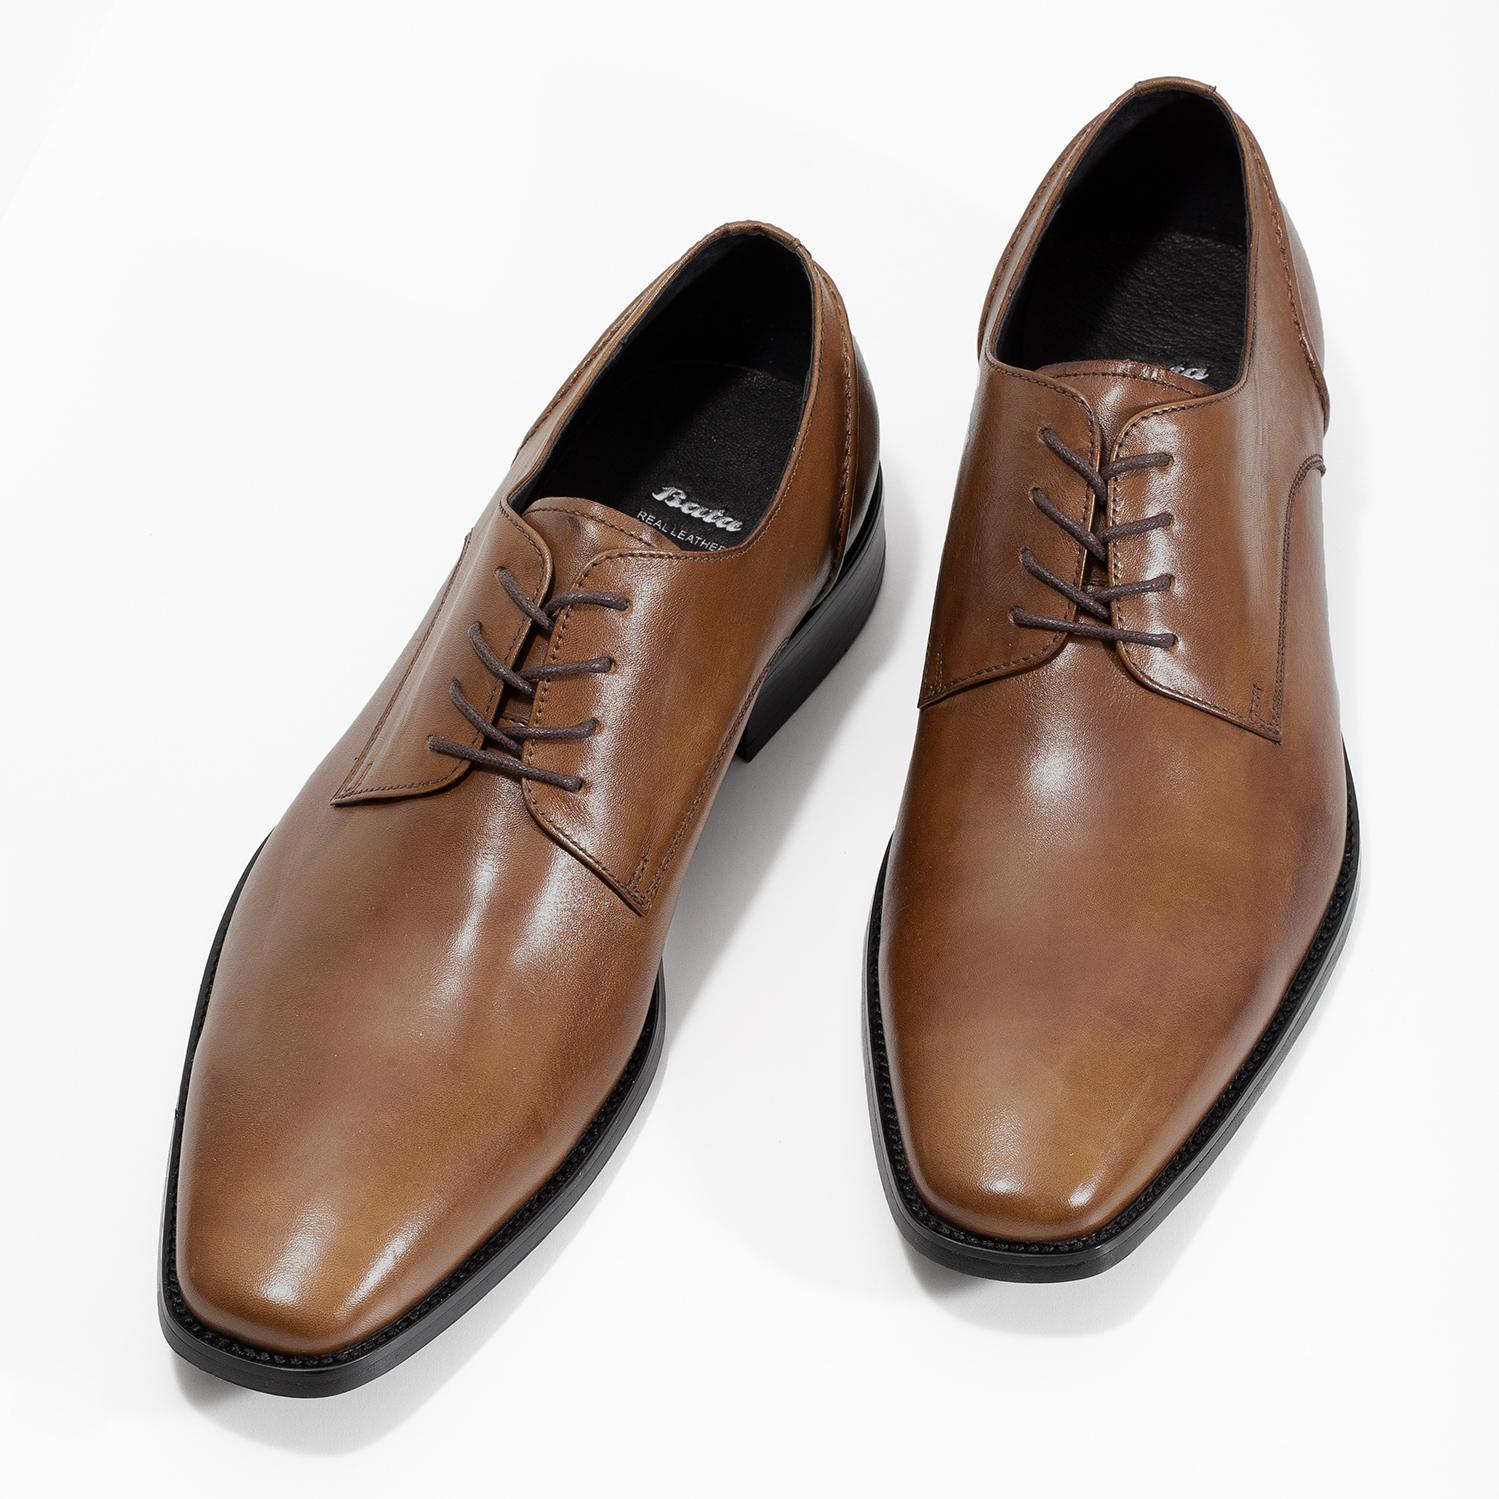 6626eab268 Bata Brown Leather Derby Shoes - Dress